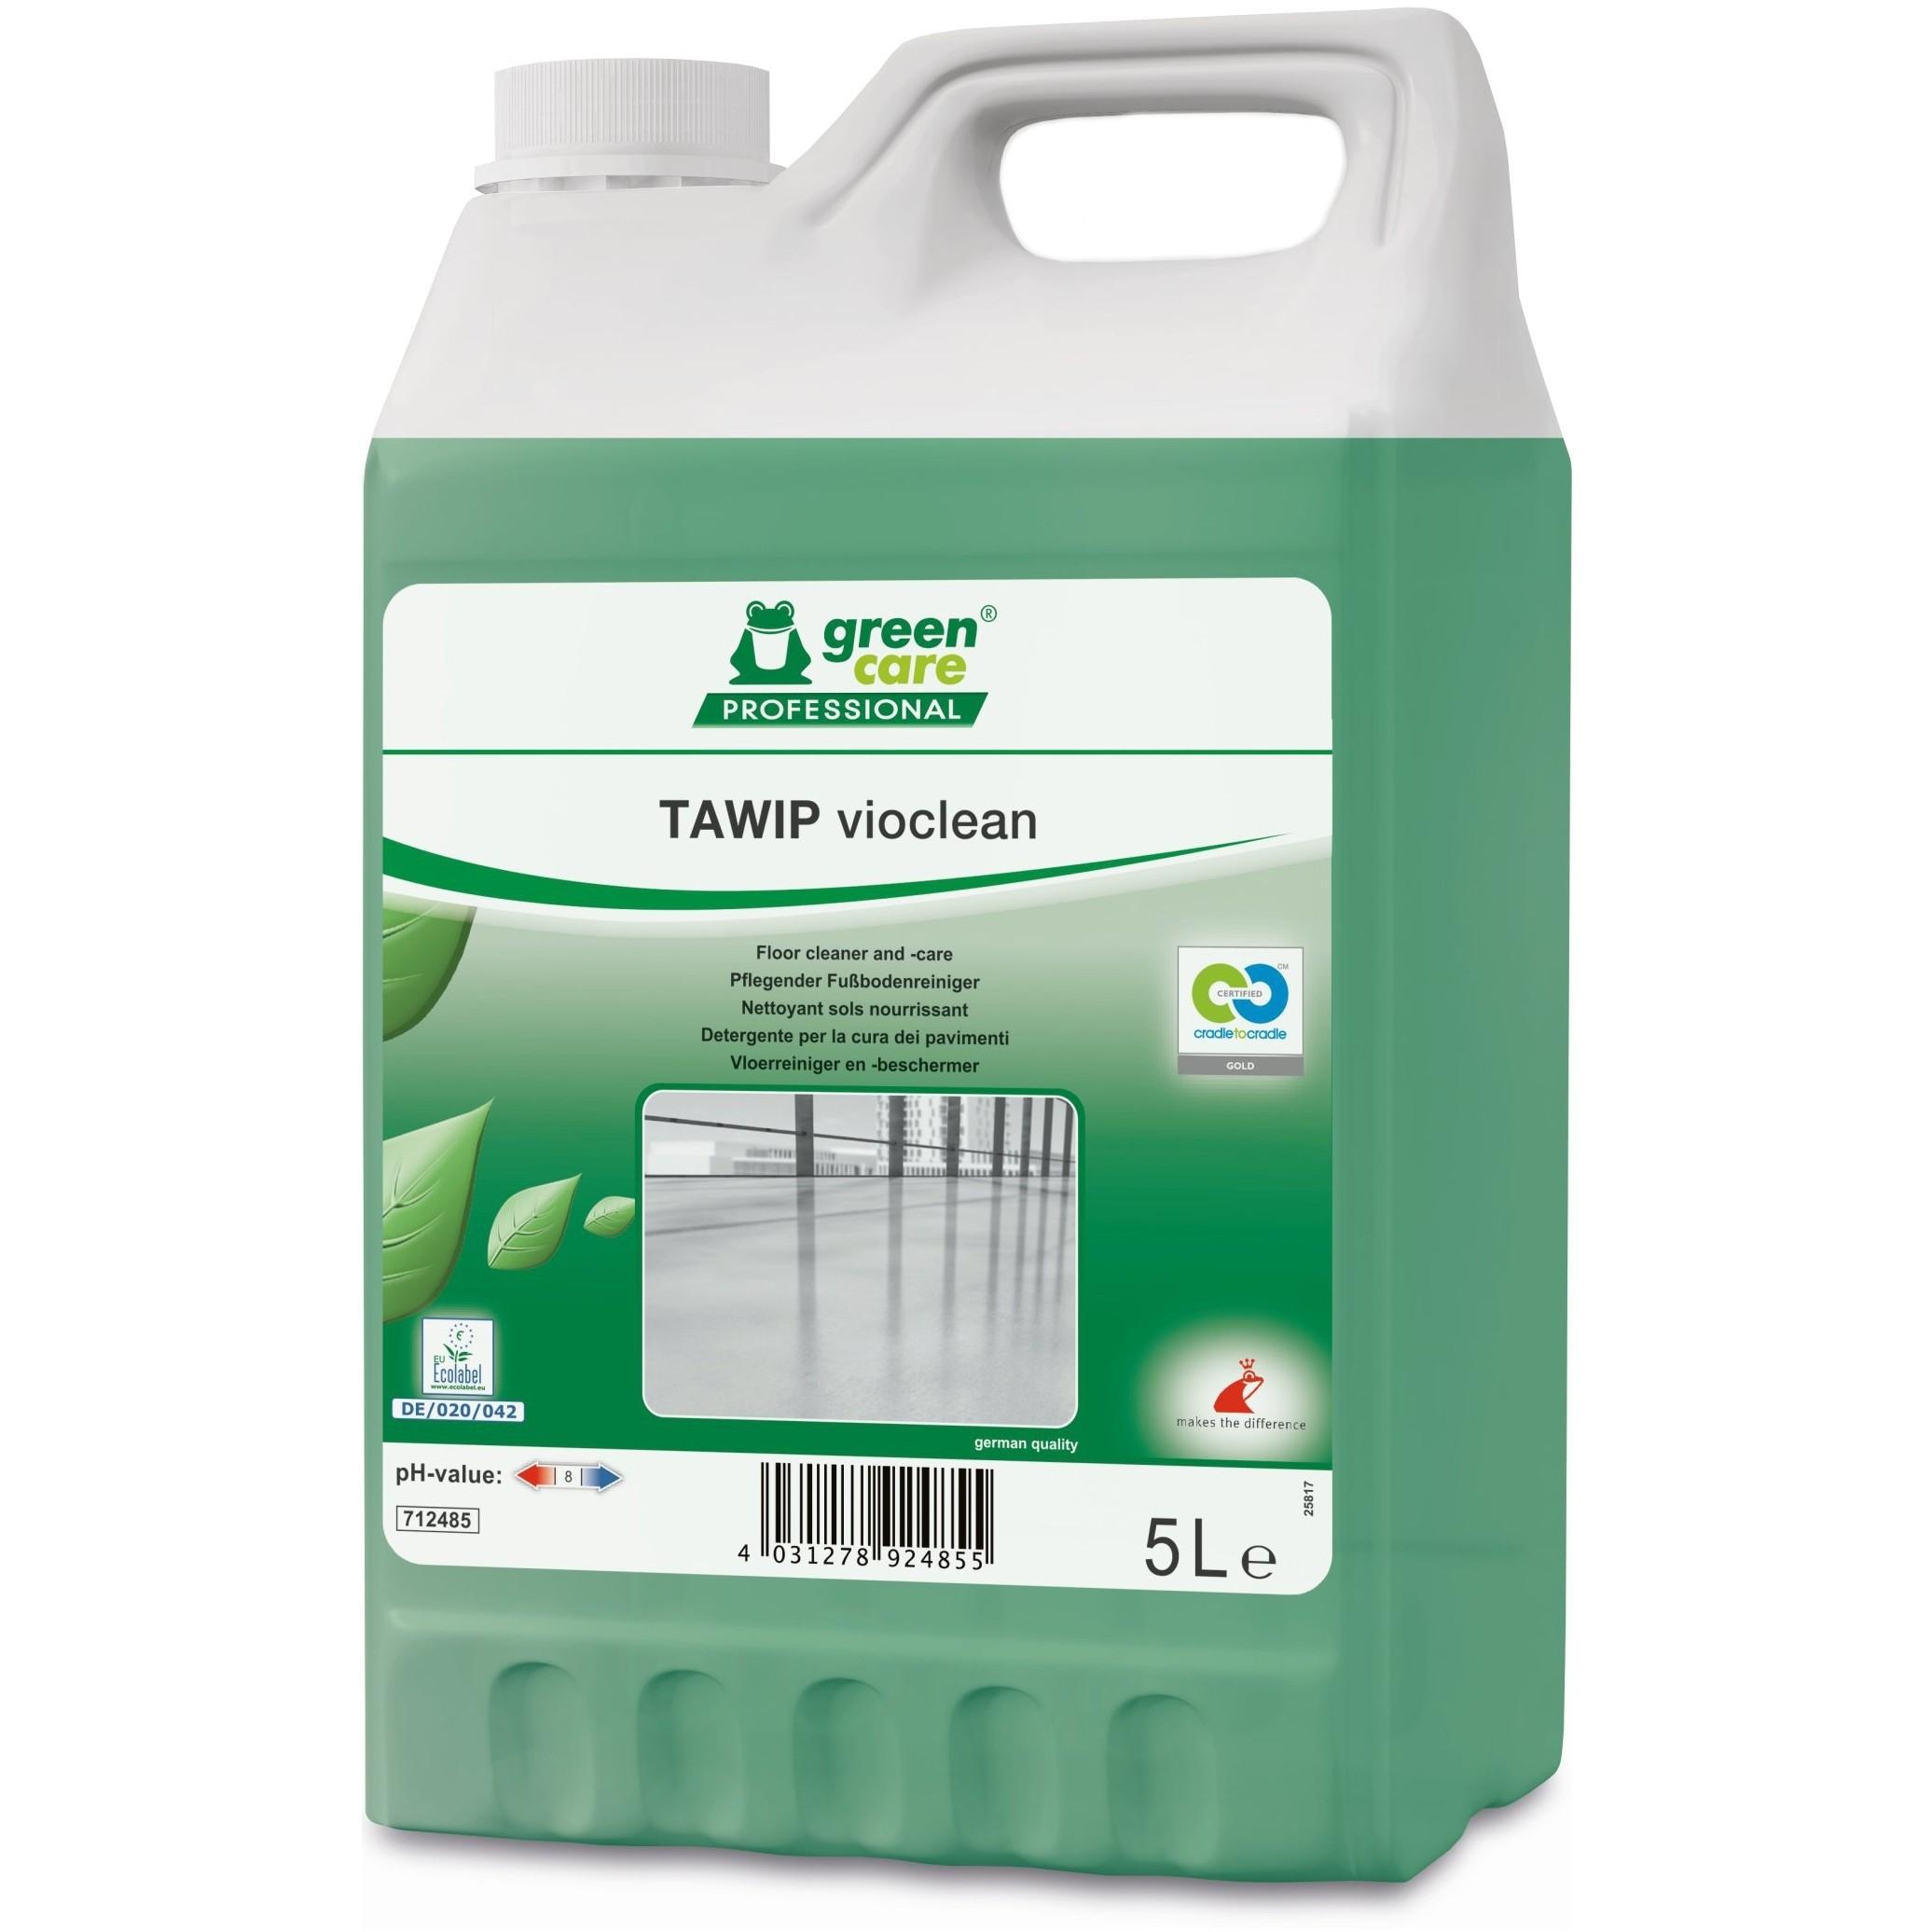 Detergent Ecologic Concentrat Pardoseli Tawip Vioclean 5l sanito.ro